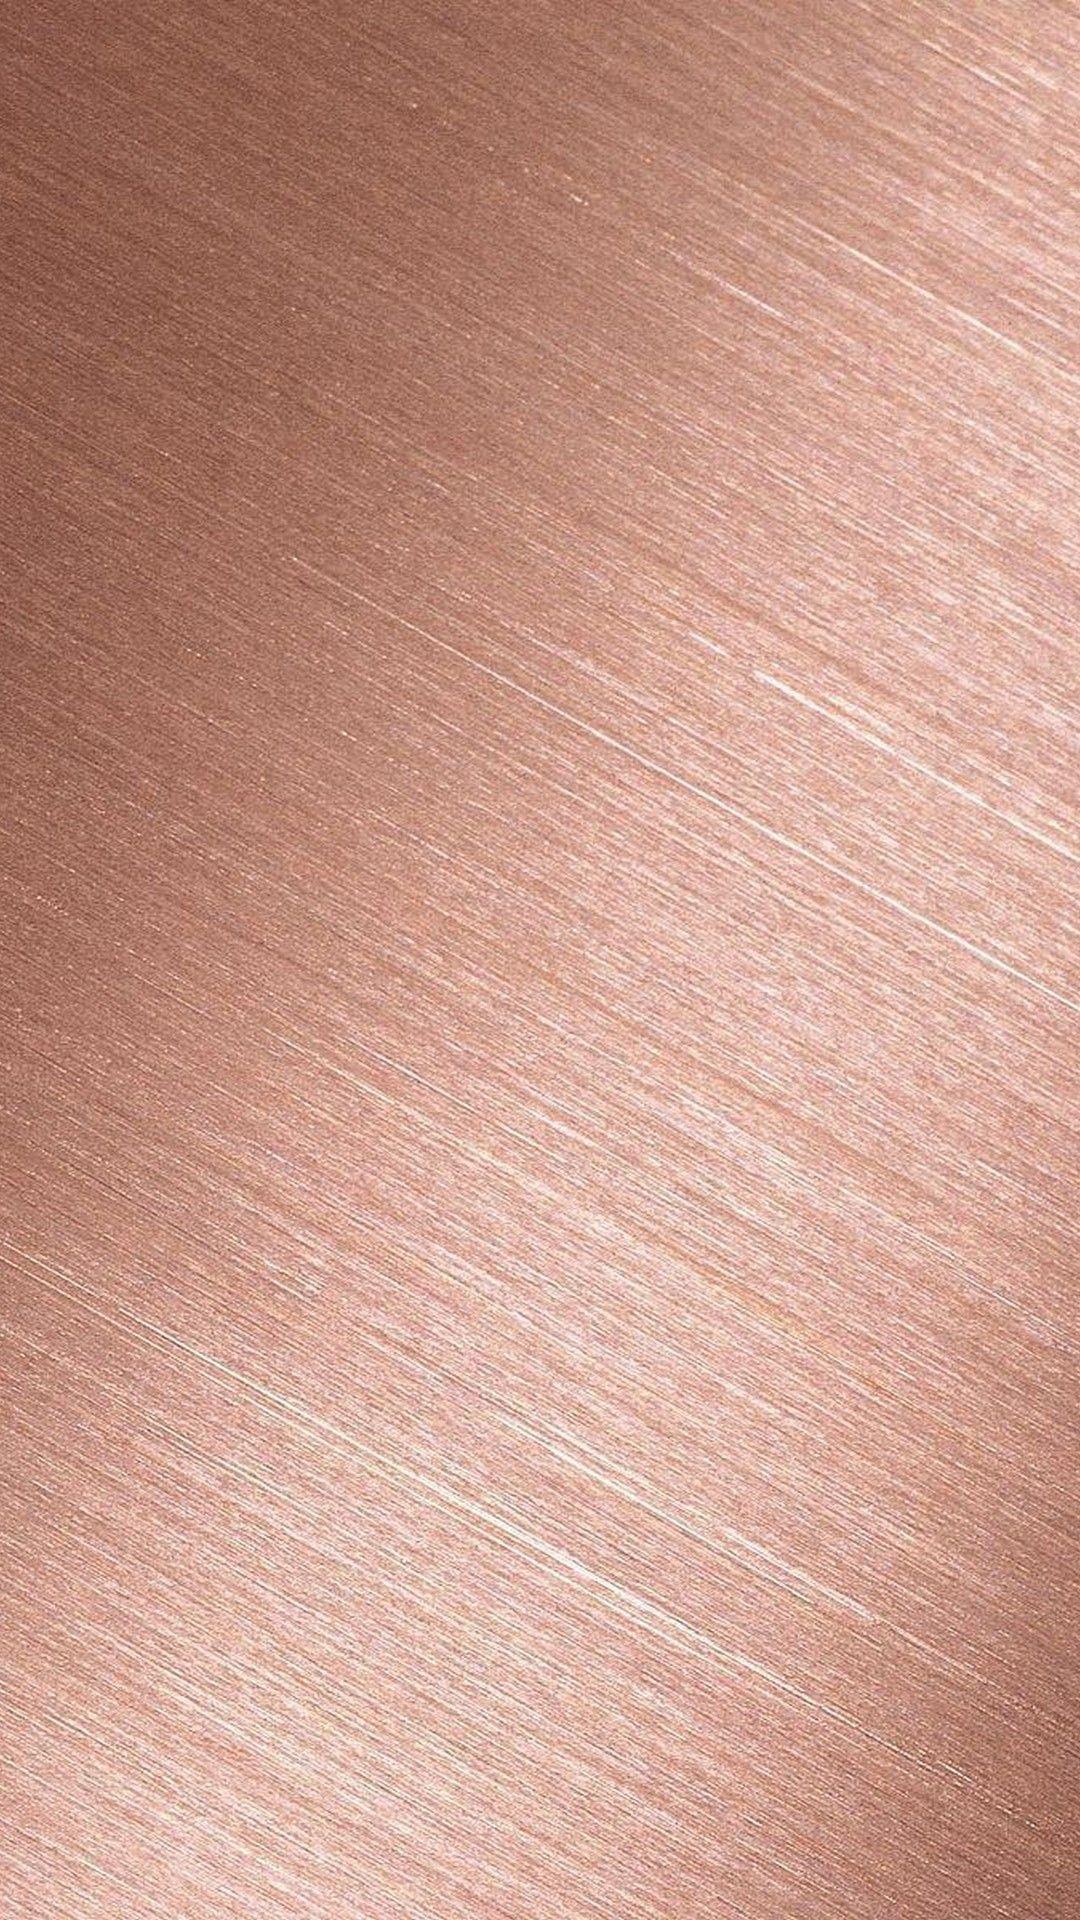 PINTEREST Jessica Conner love beautiful texture